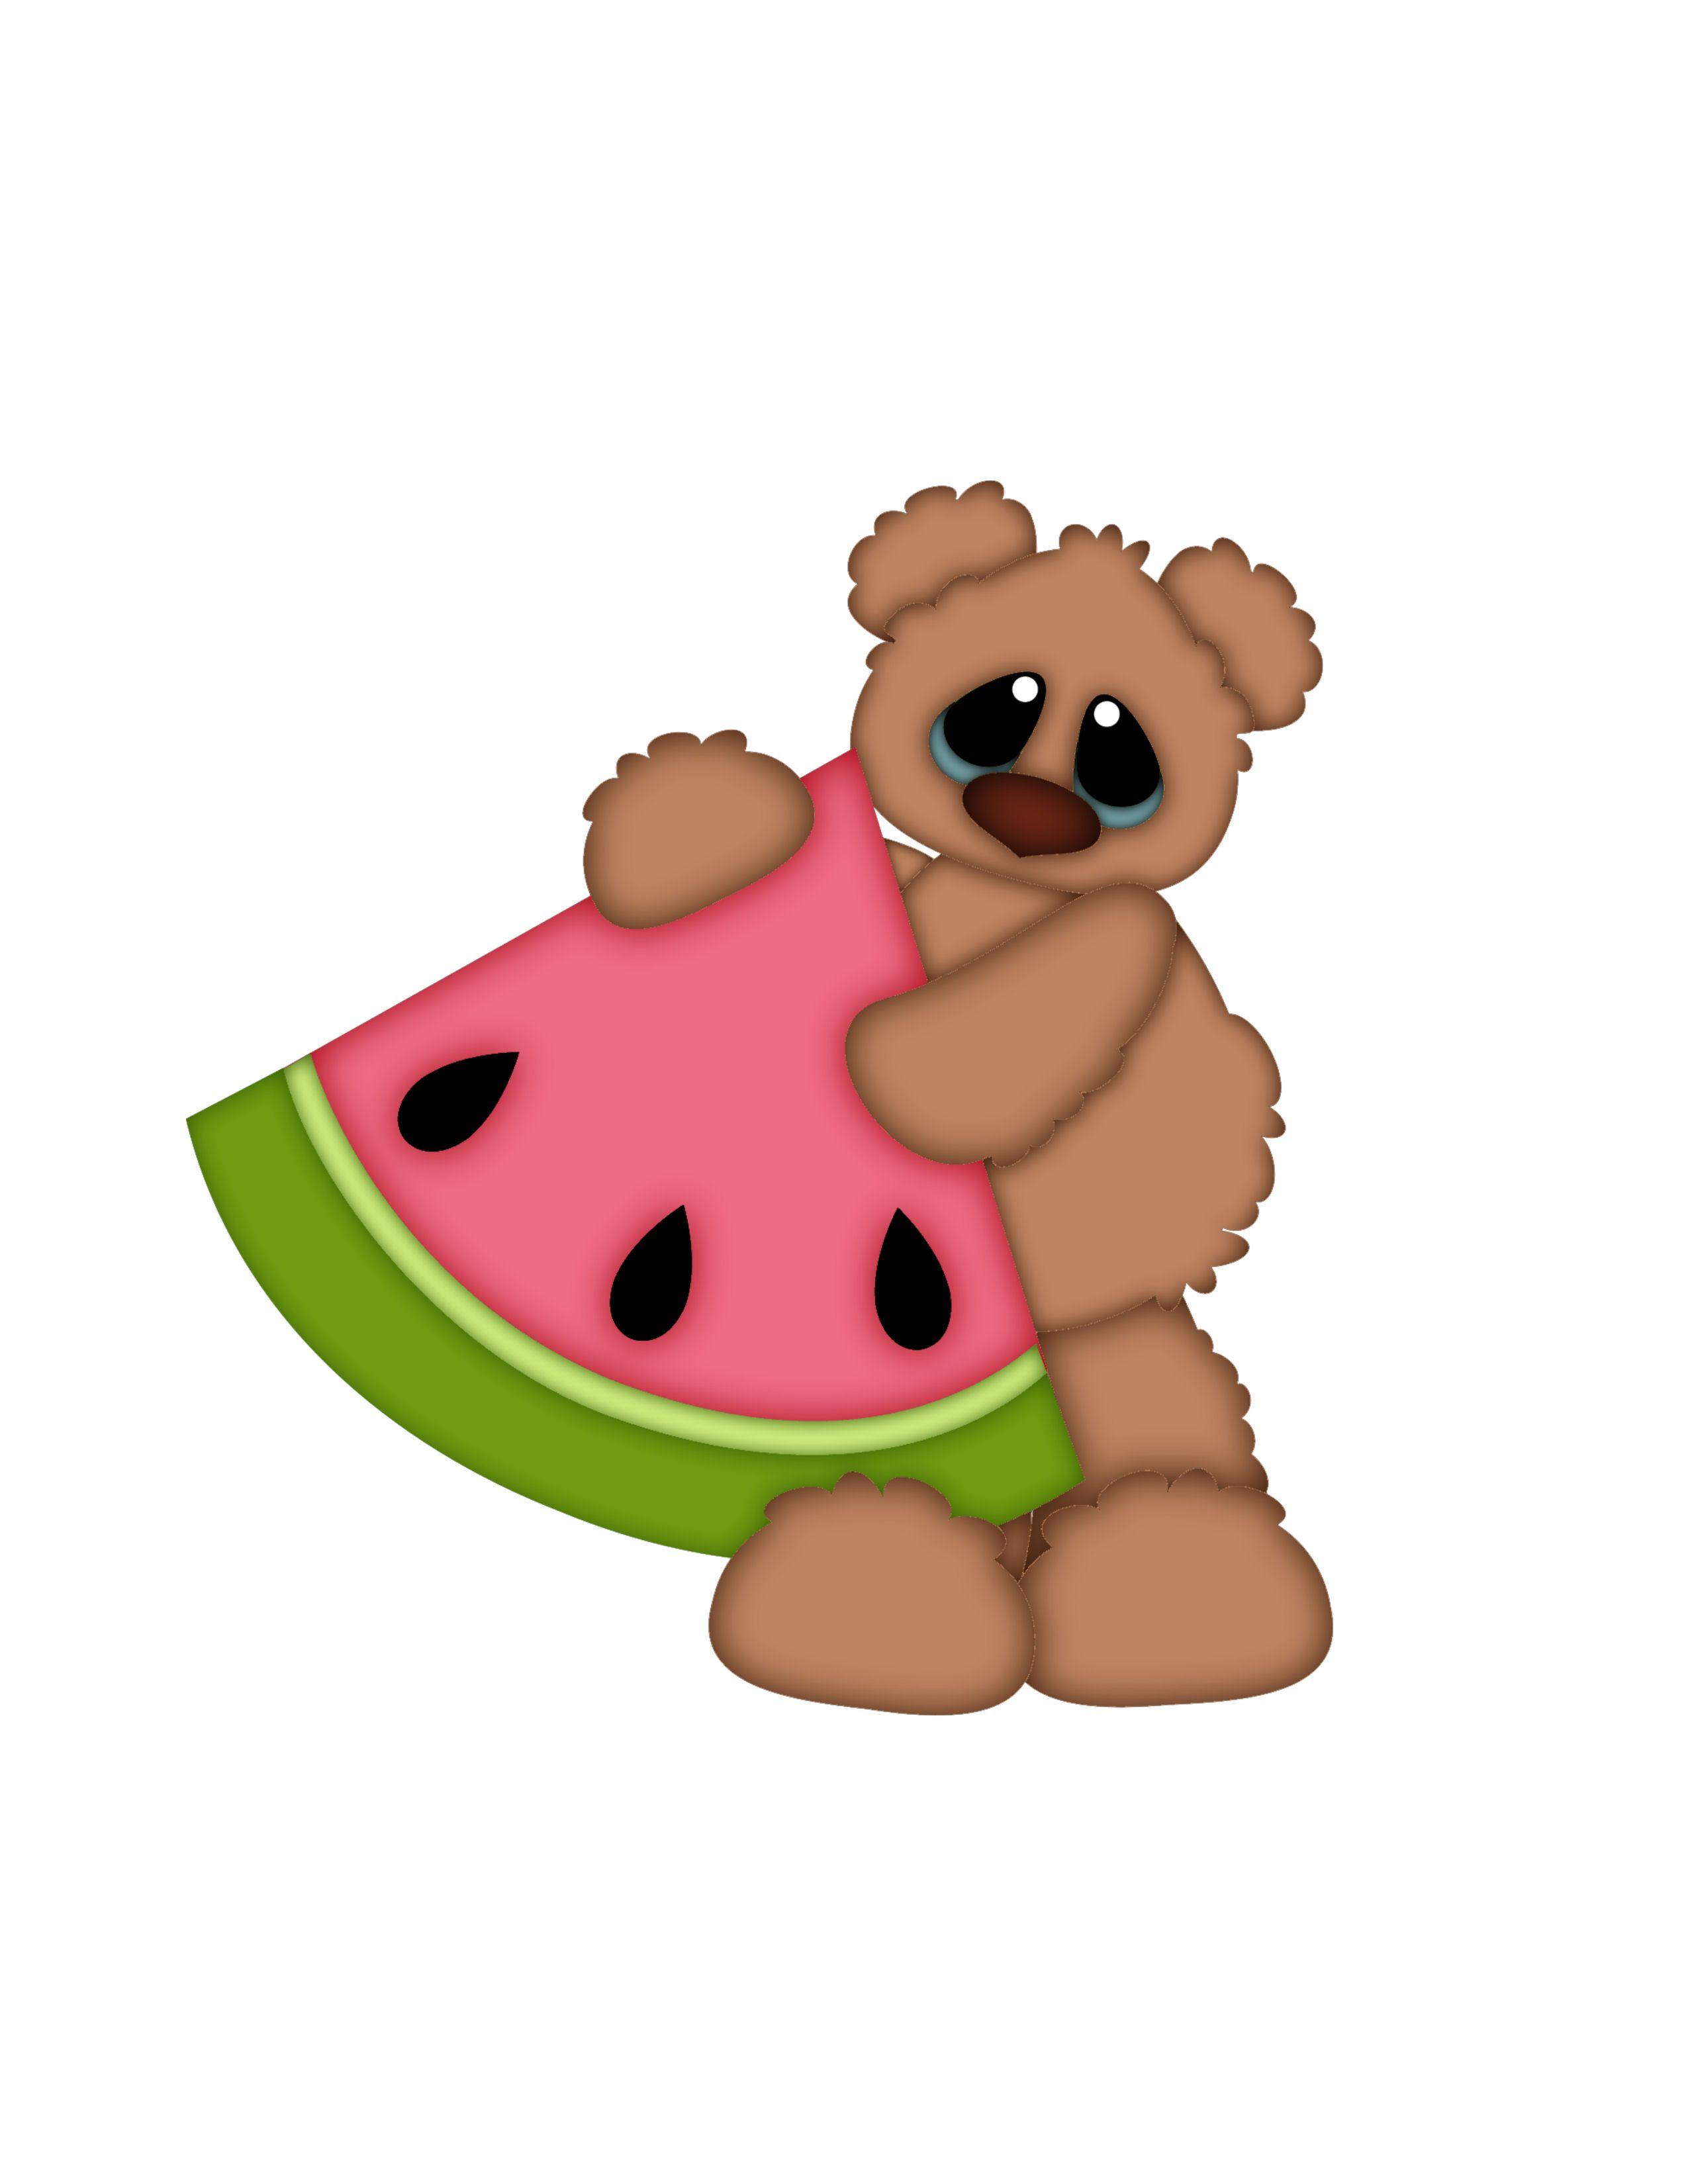 2550x3300 Watermelon Teddy Bear